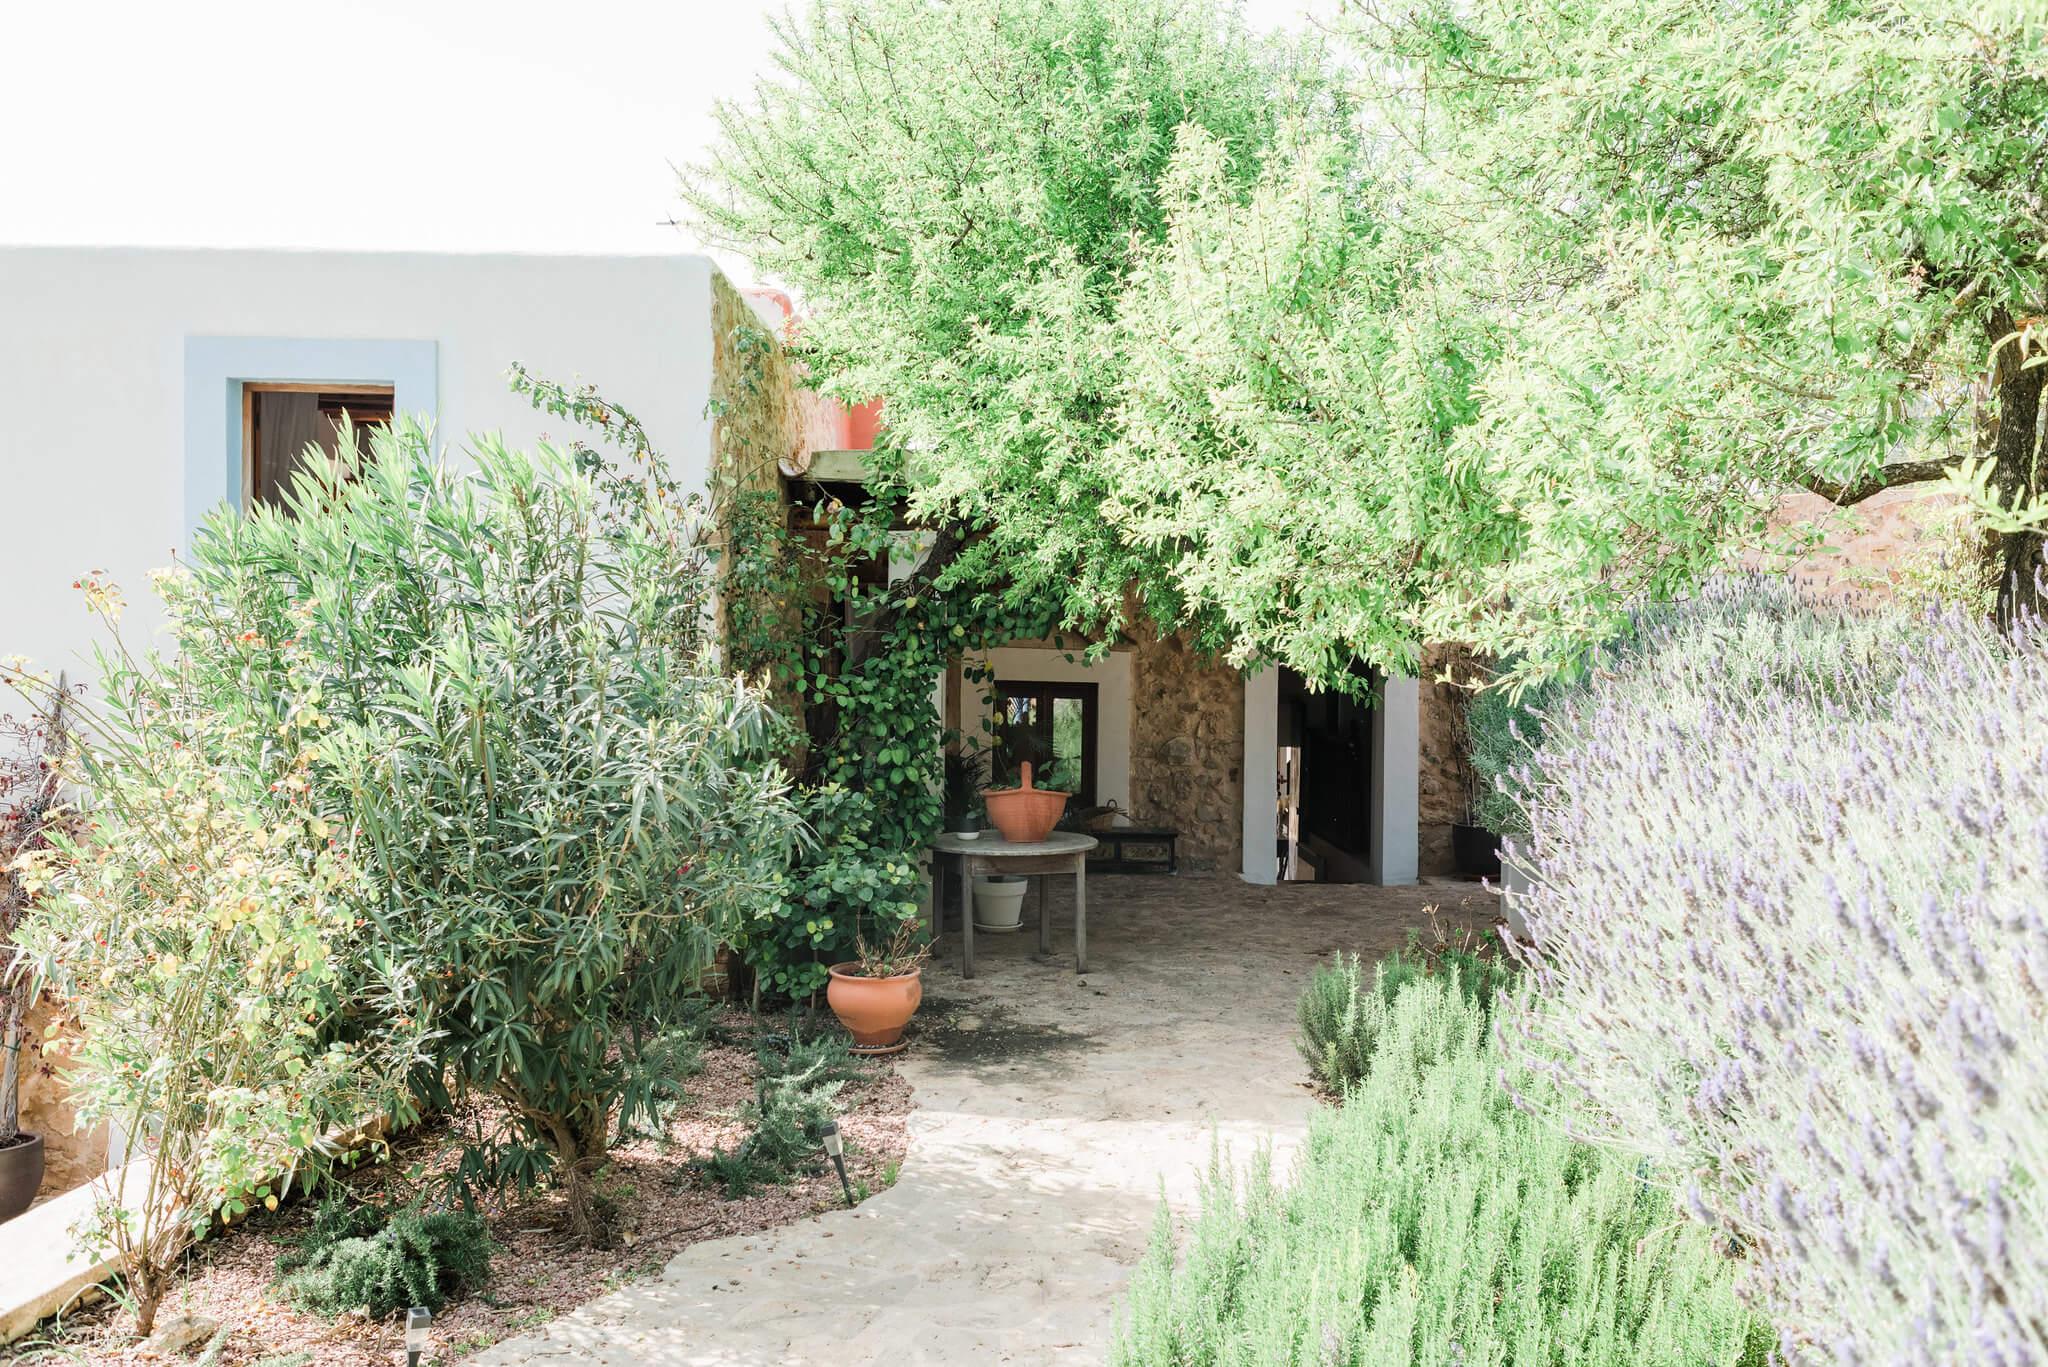 https://www.white-ibiza.com/wp-content/uploads/2020/06/white-ibiza-villas-los-corrales-exterior-path2.jpg